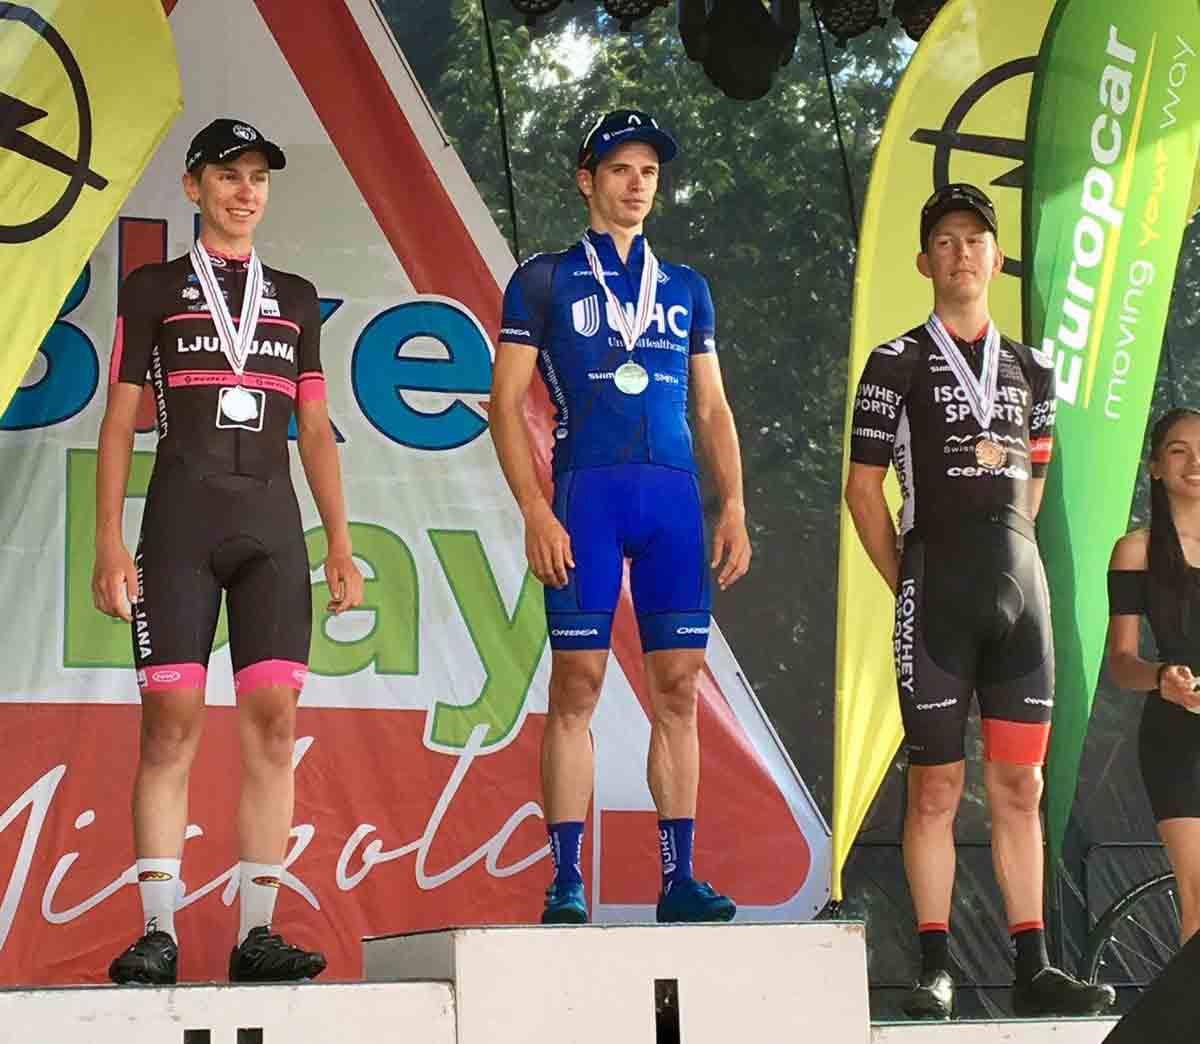 Daniel Alexander Jaramillo vince la quarta tappa del Giro d'Ungheria